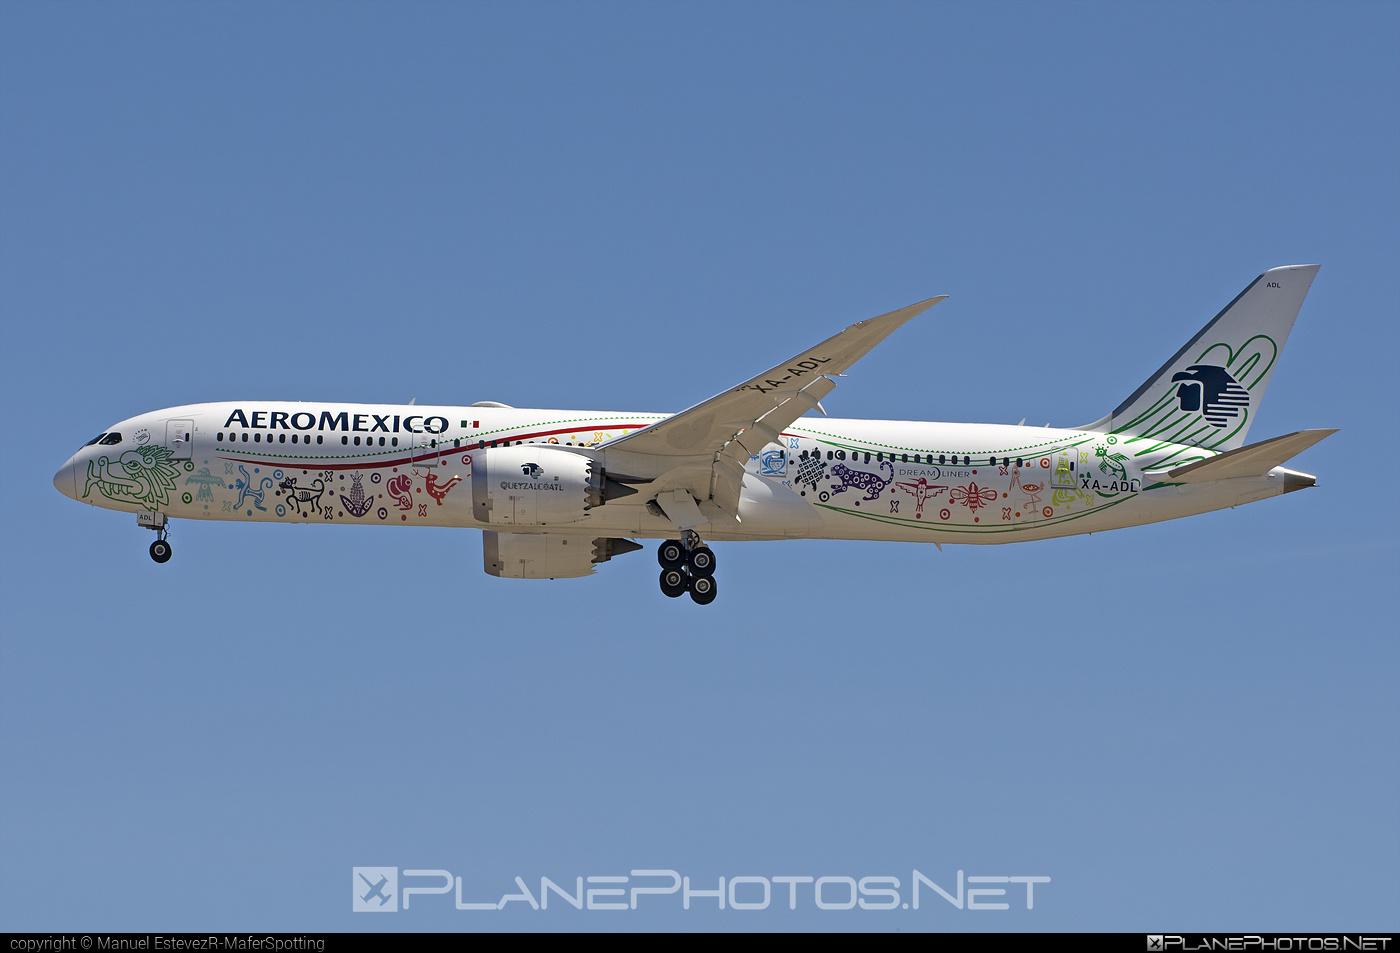 Boeing 787-9 Dreamliner - XA-ADL operated by Aeroméxico #b787 #boeing #boeing787 #dreamliner